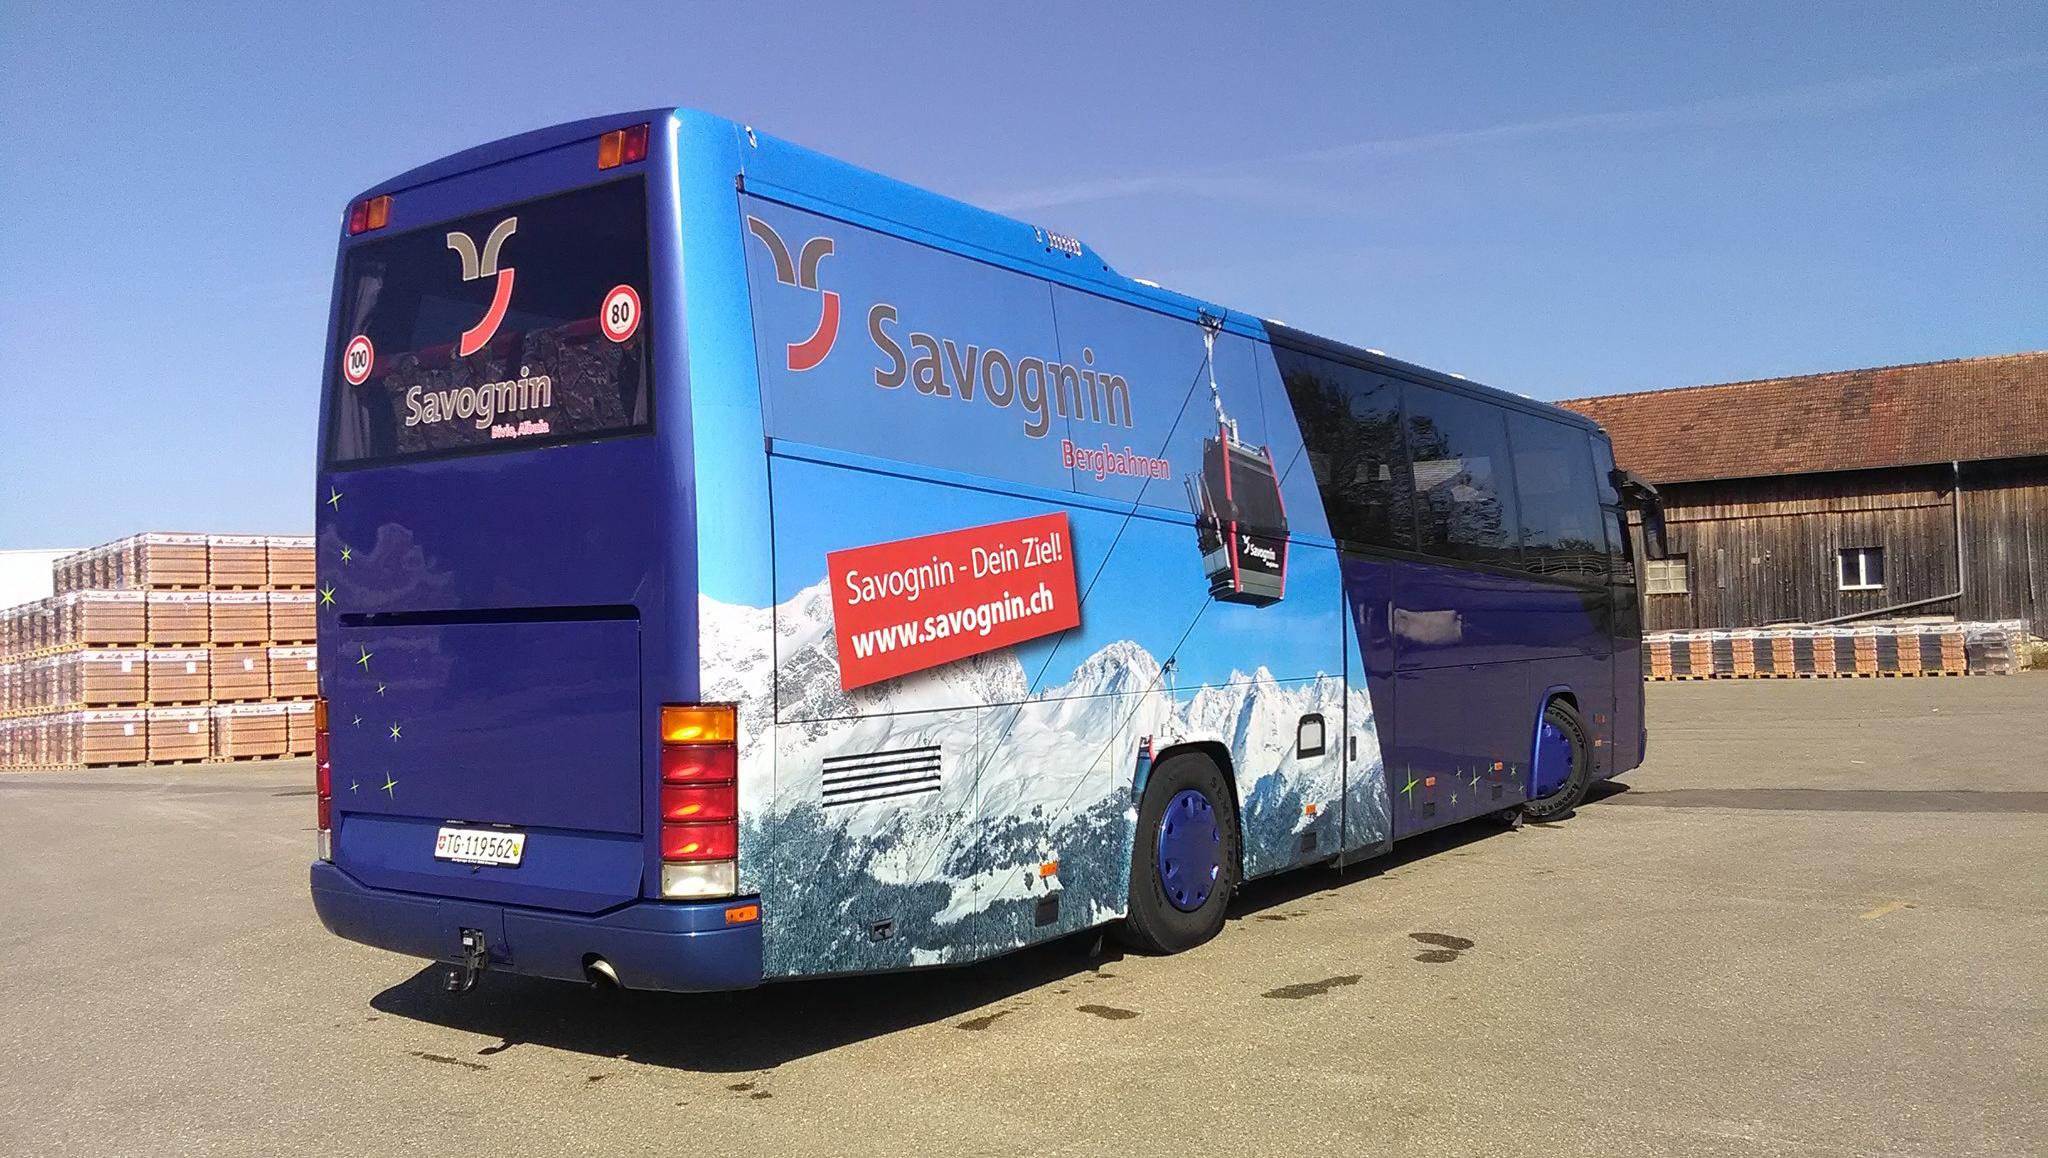 Skiexpress Savognin by Car